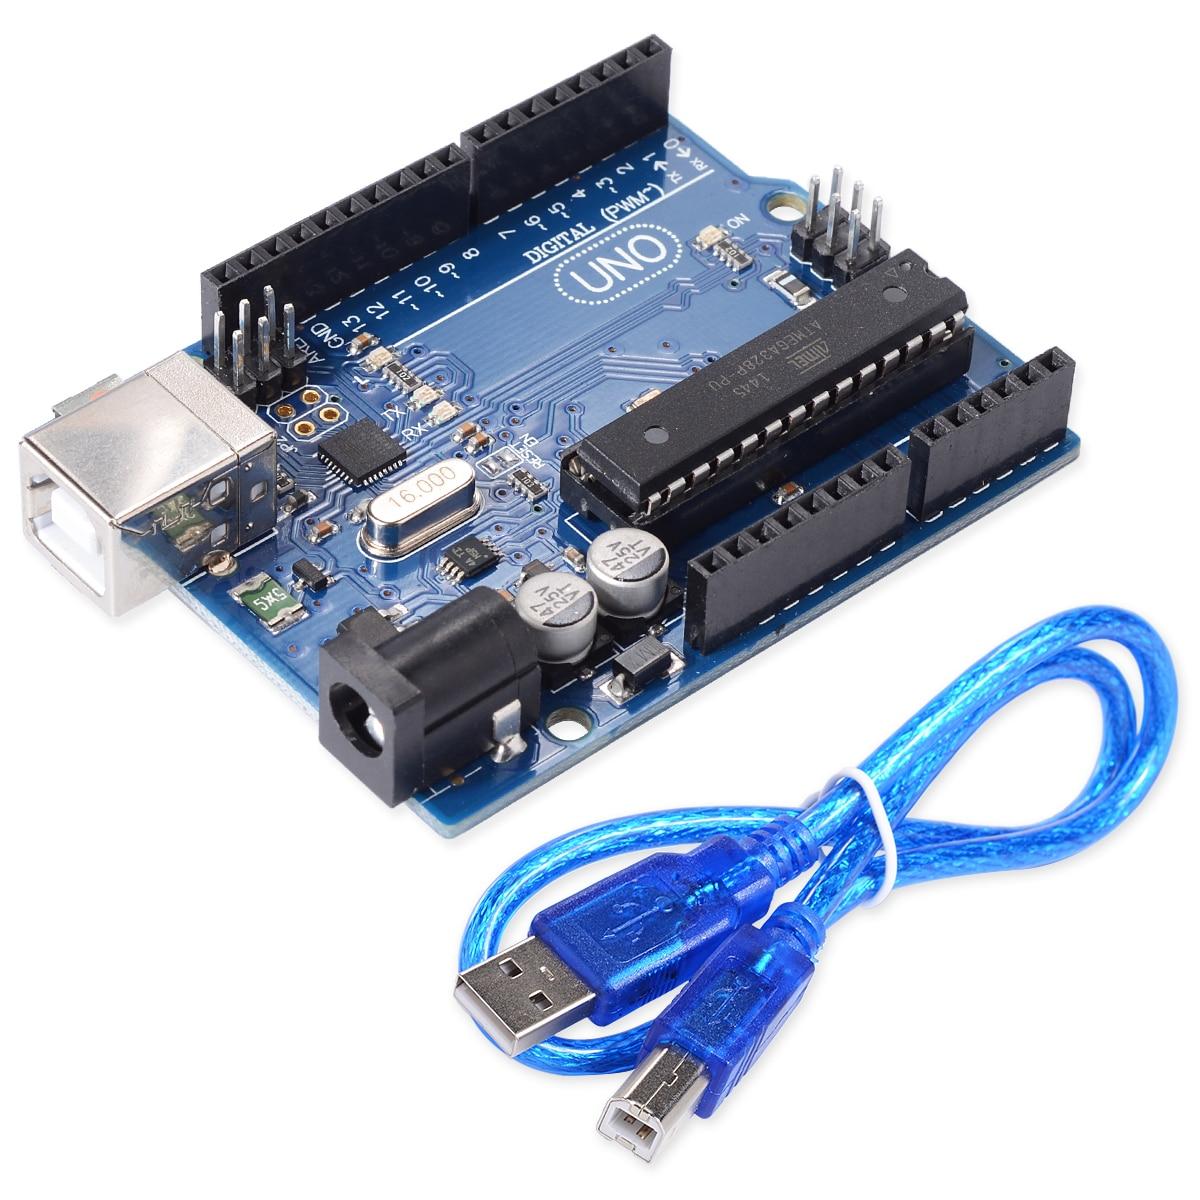 10 pcs UNO R3 pour Arduino (sans LOGO) MEGA328P ATMEGA16U2 avec câble